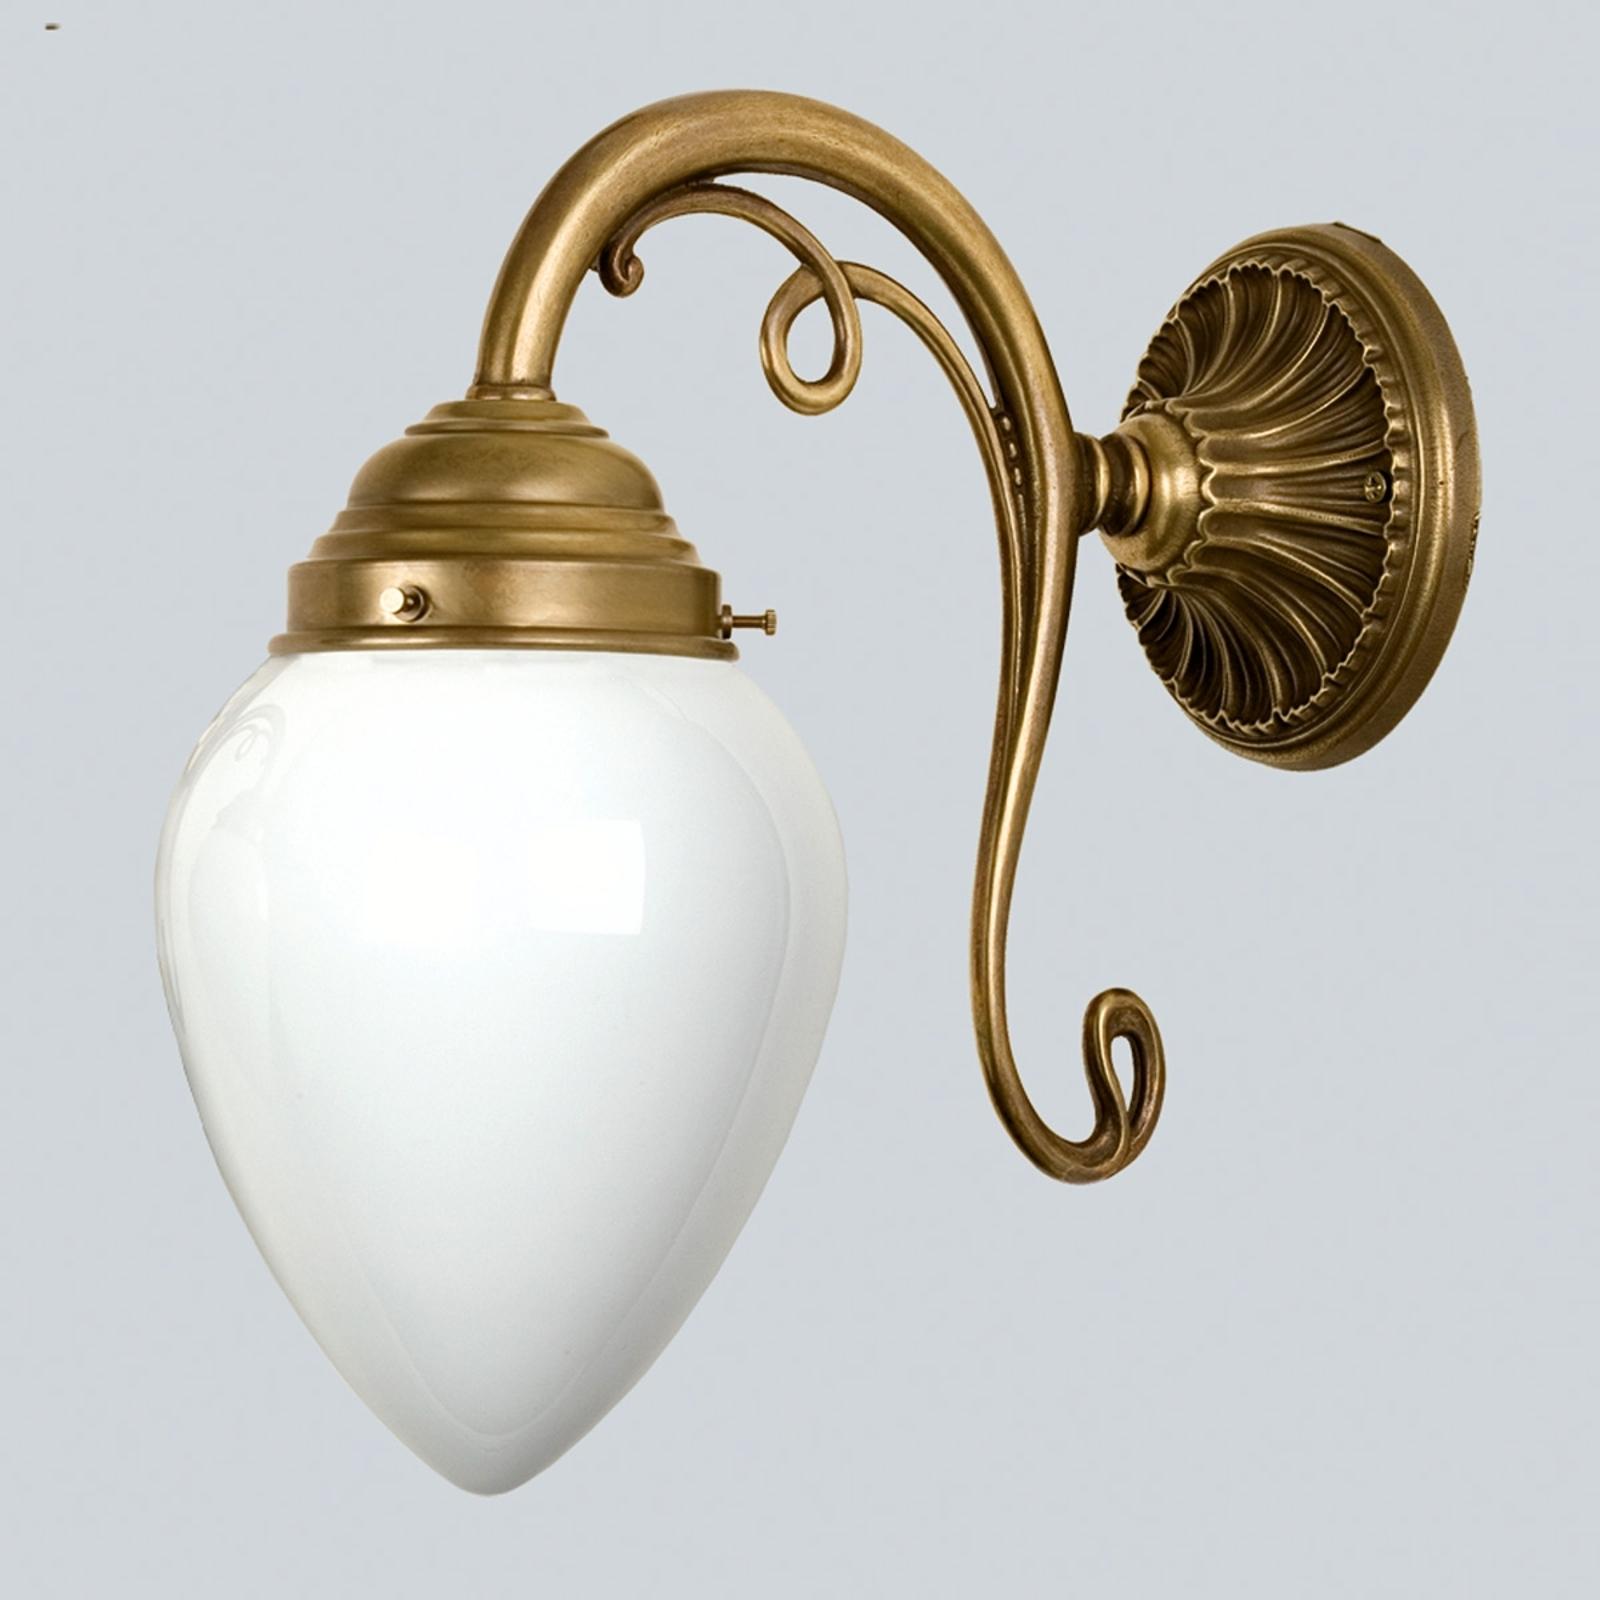 Paris elegant wall light made of brass_1542108_1